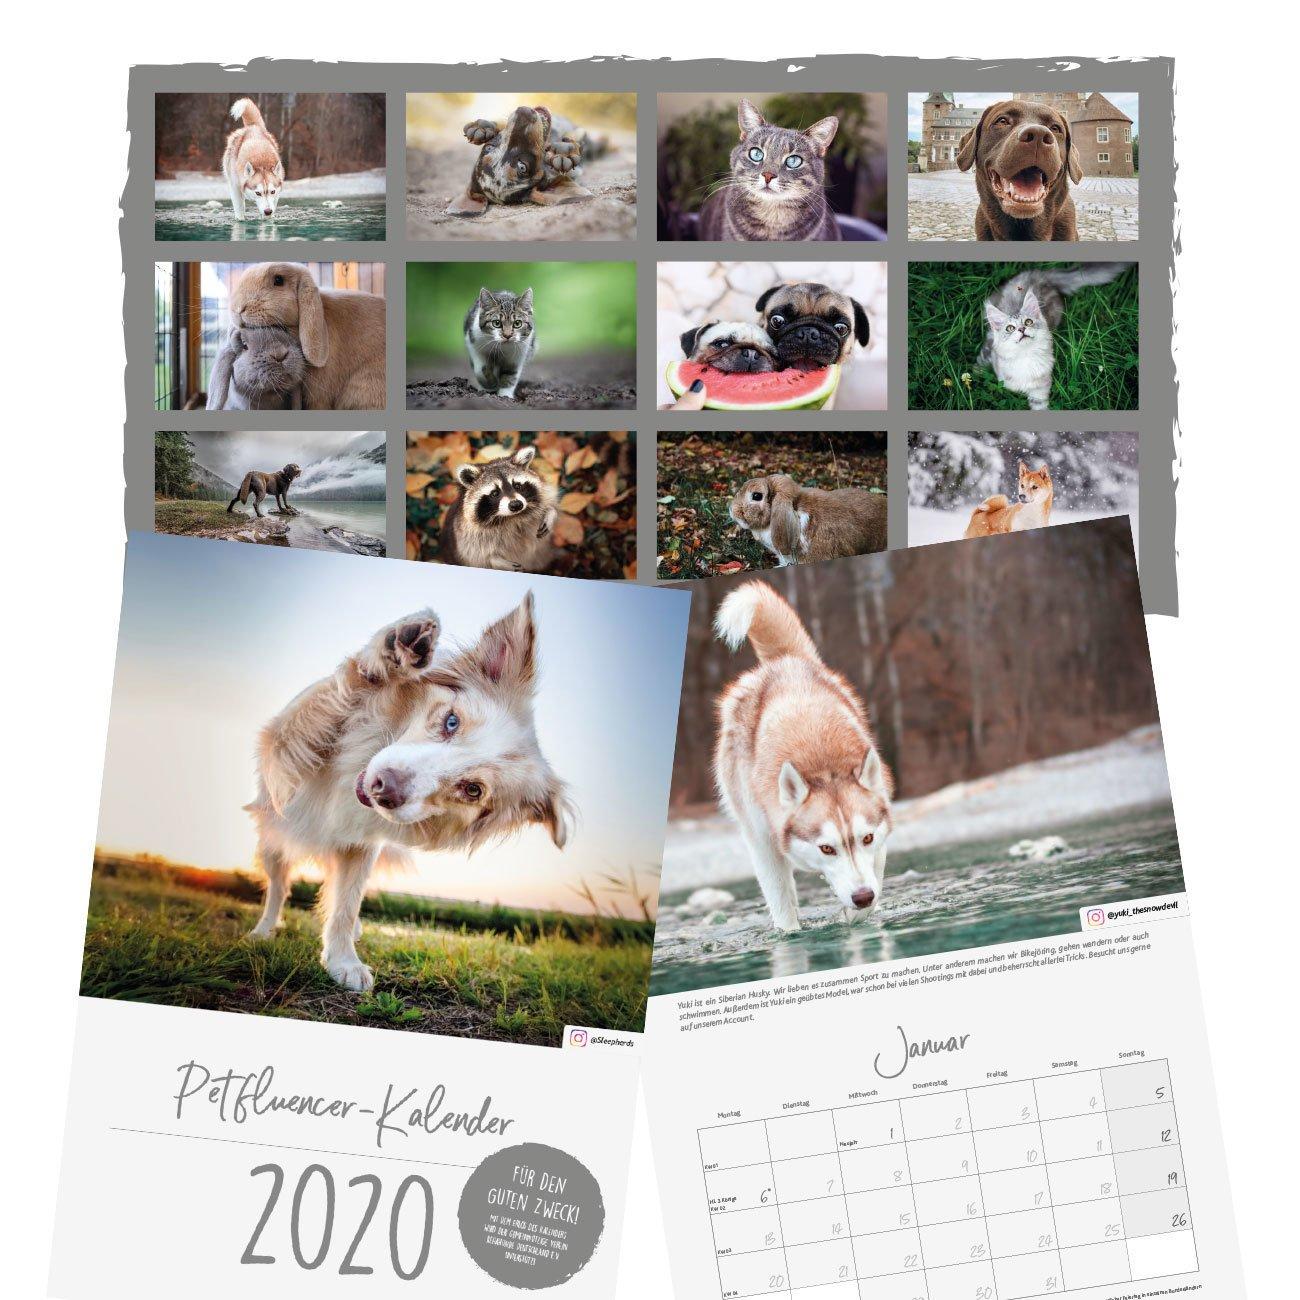 Trixie Petfluencer Kalender 2020, Bild 2